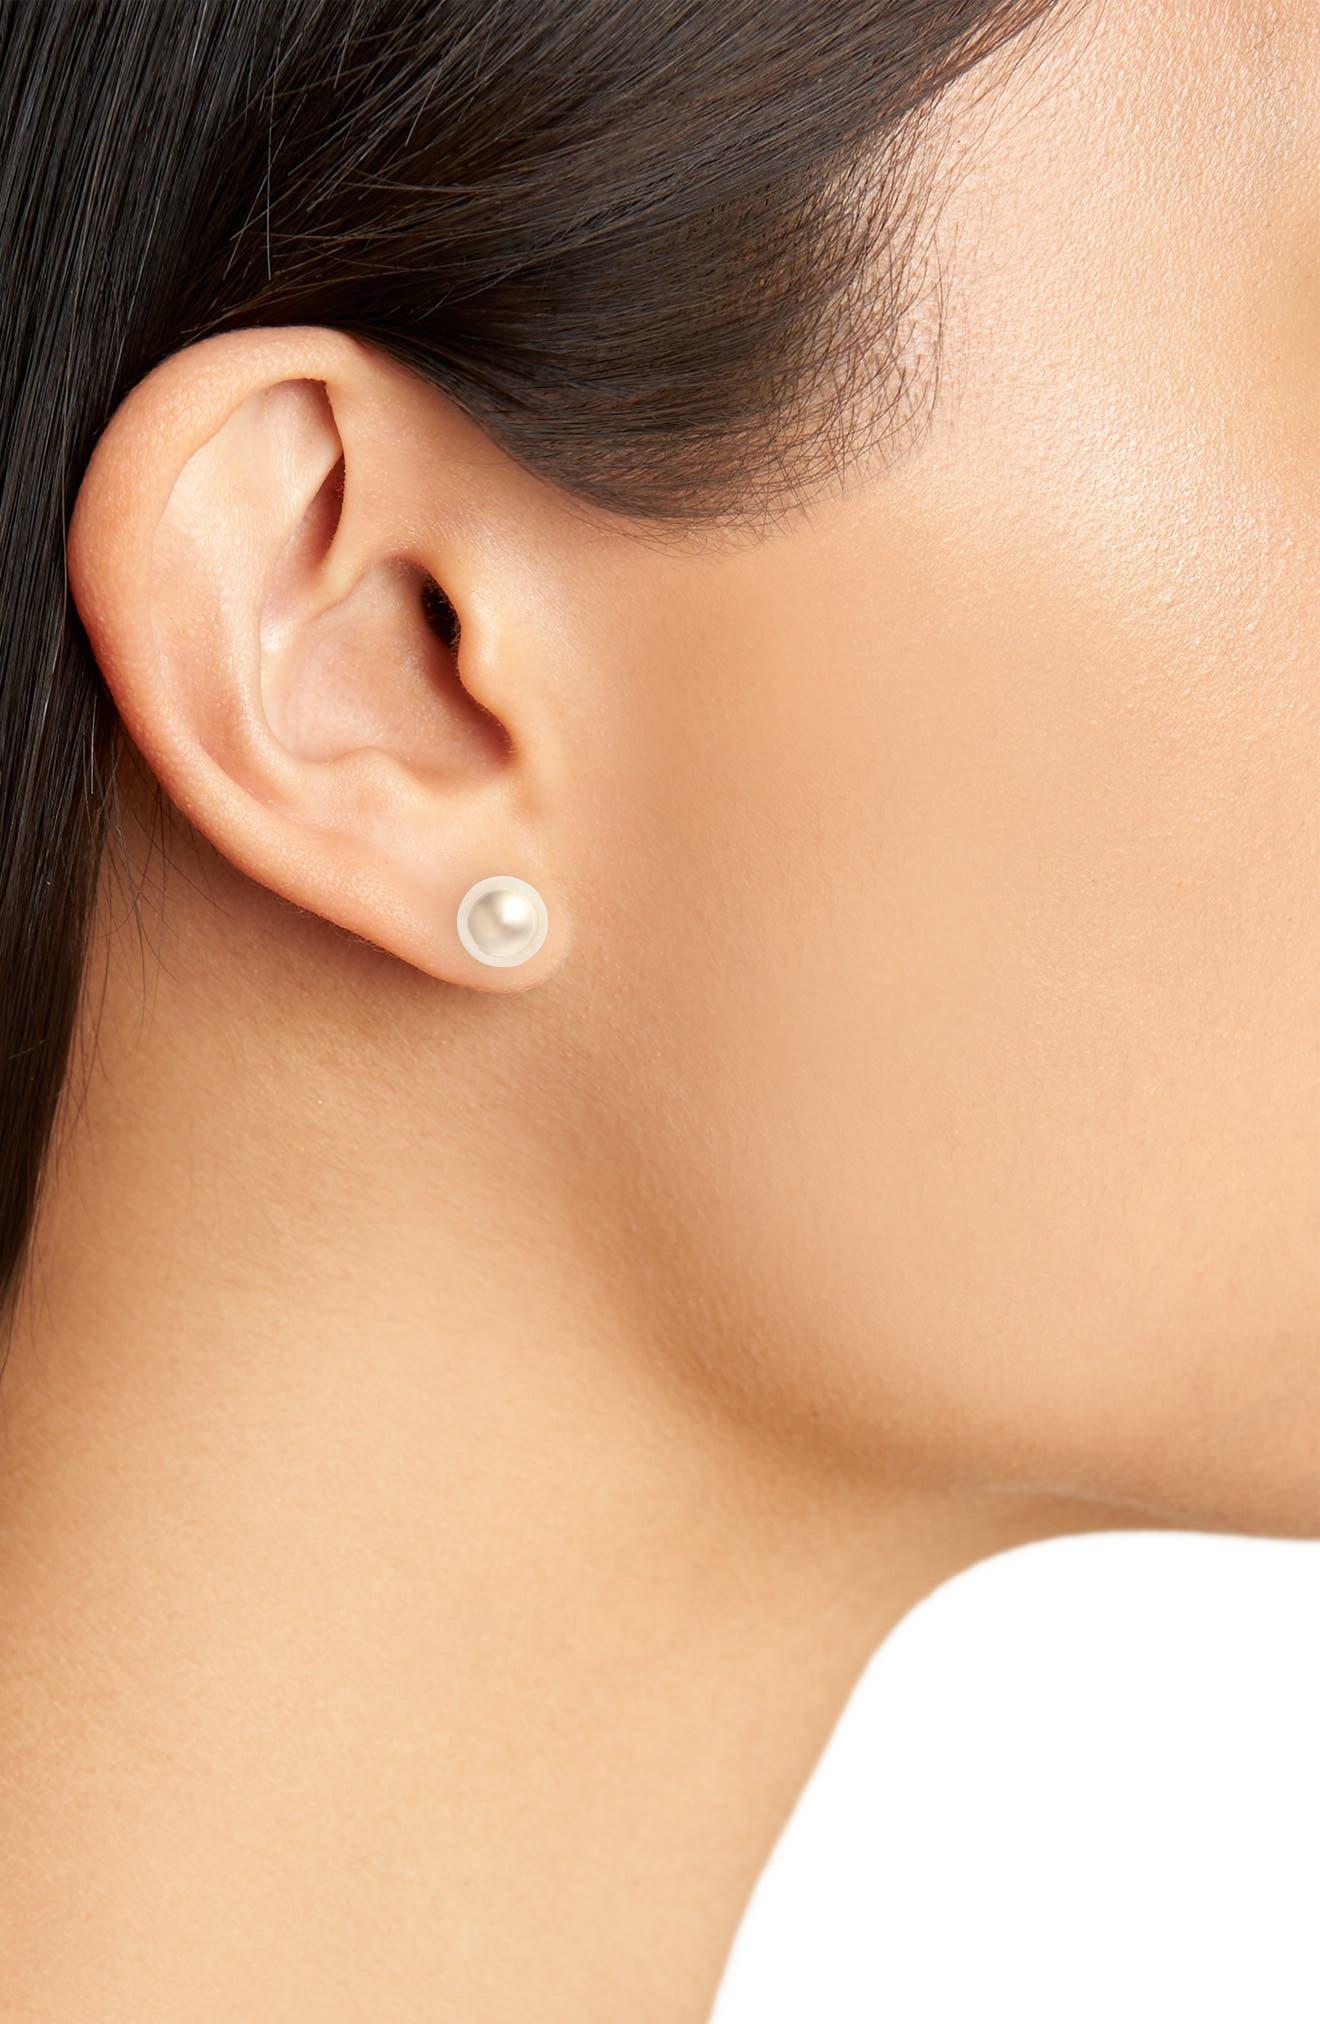 14K Ball Stud Earrings,                             Alternate thumbnail 2, color,                             YELLOW GOLD